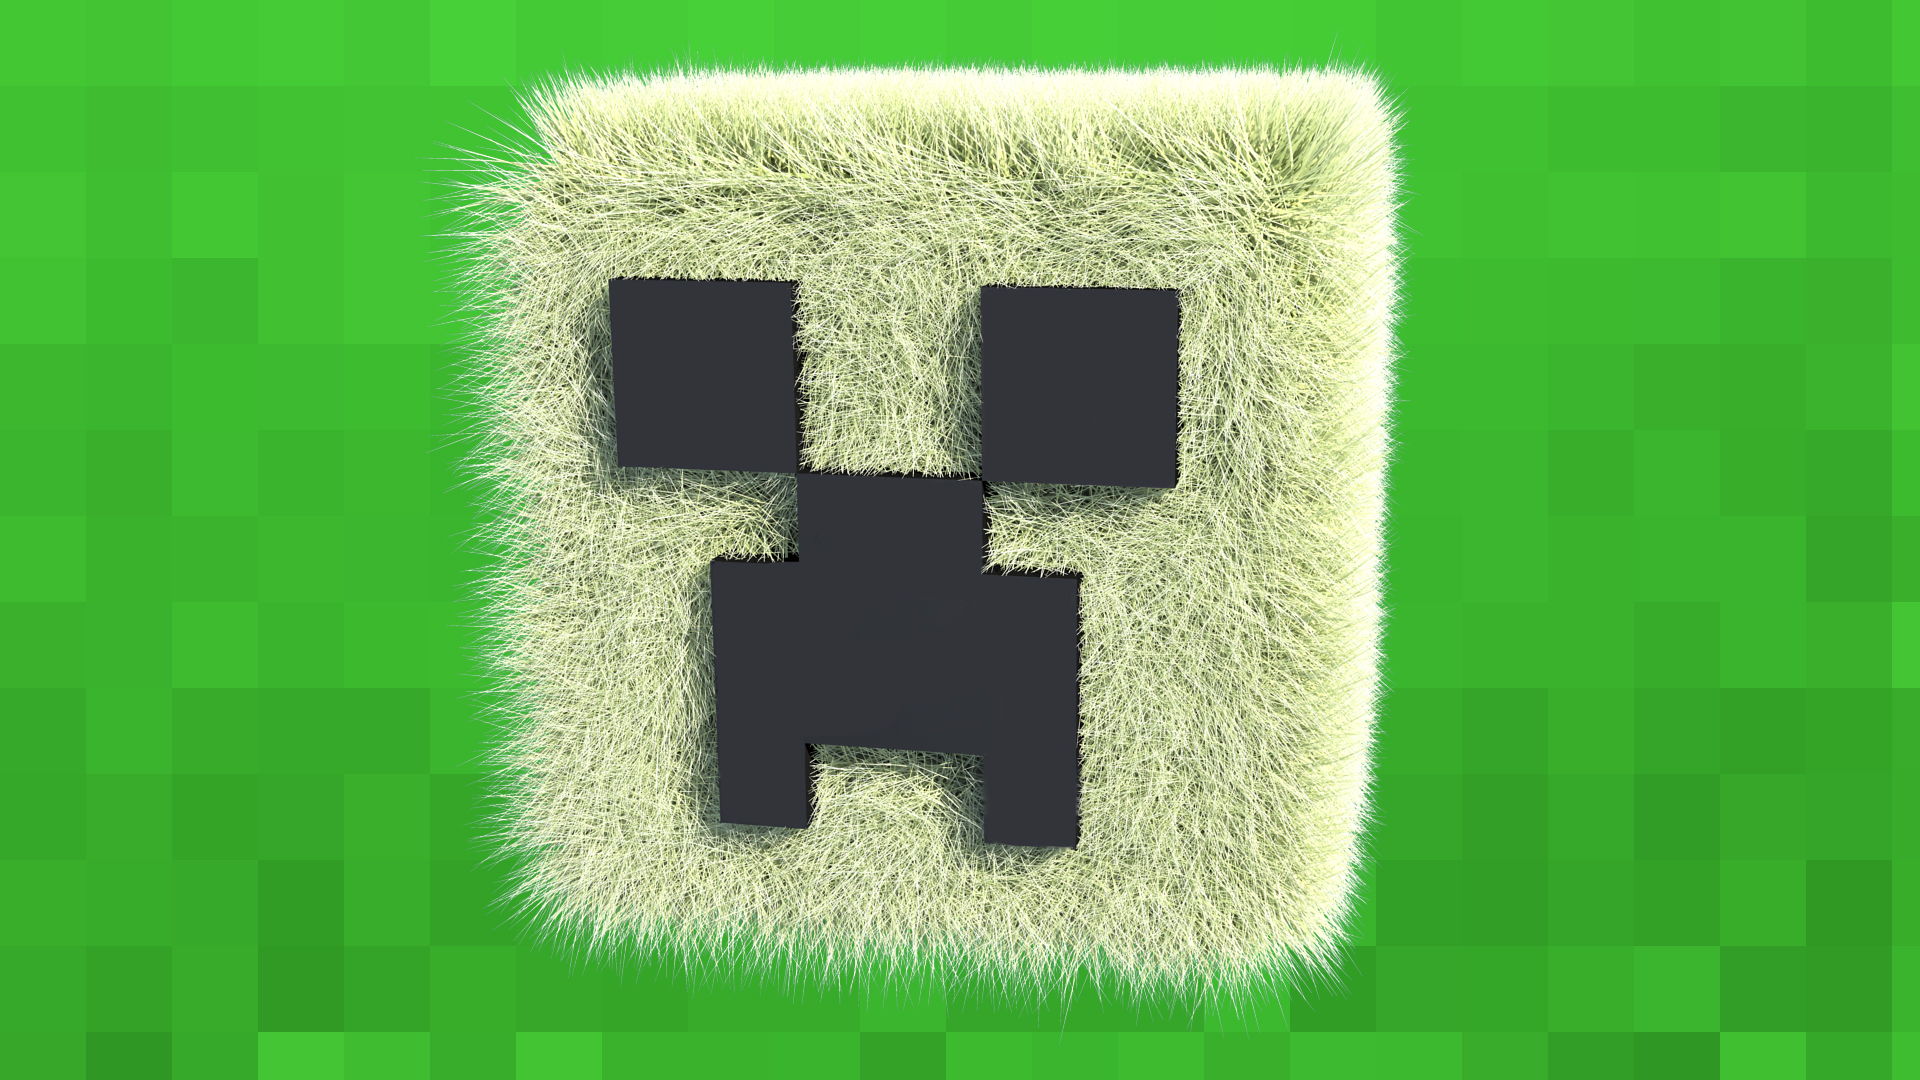 5 Gta Logo Pixel Minecraft